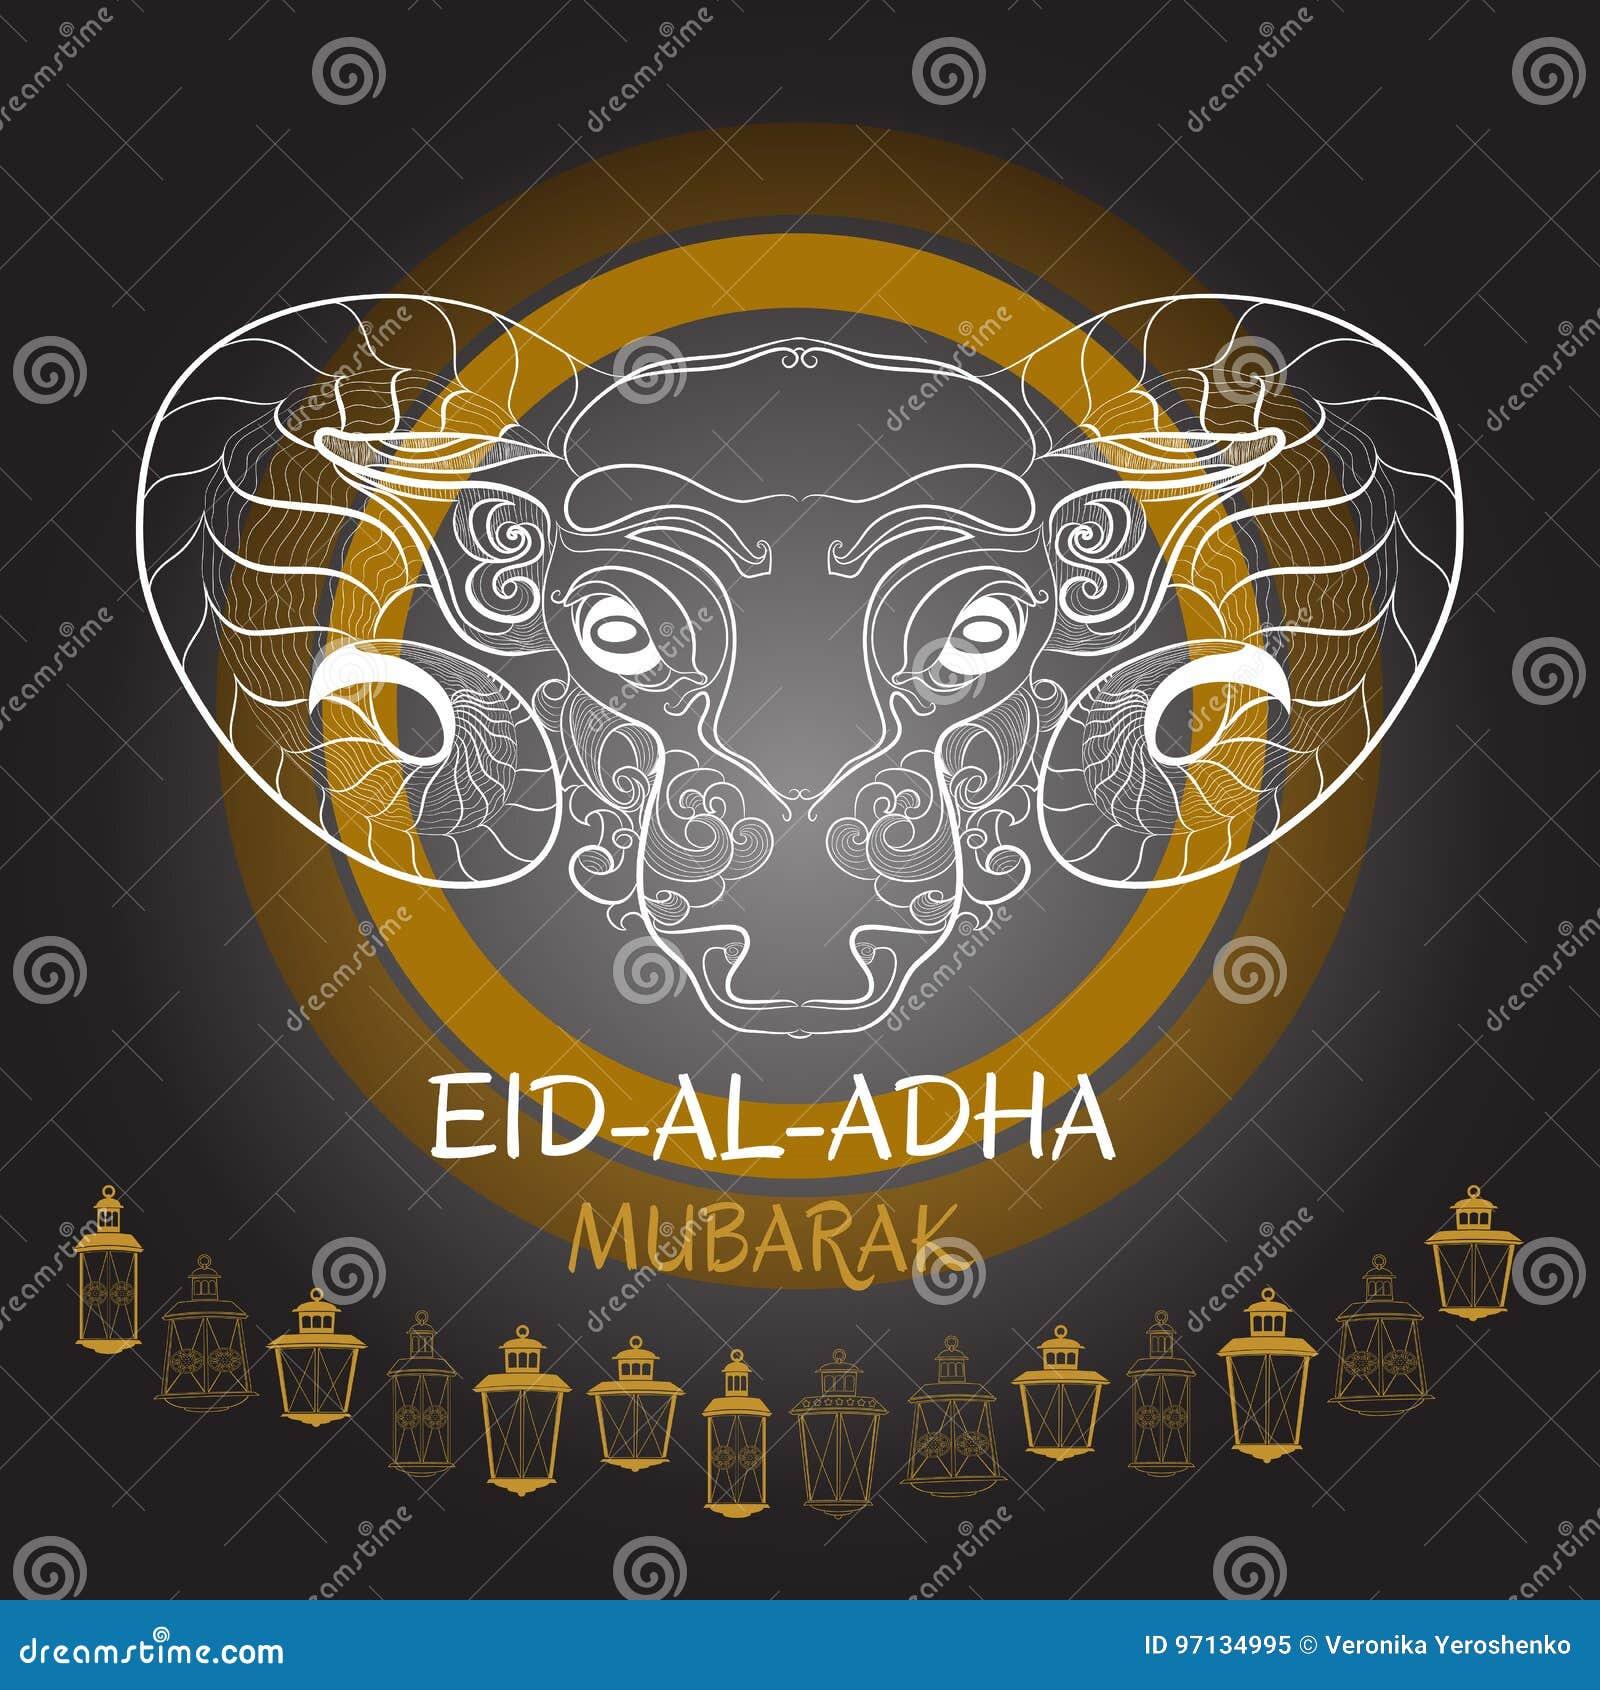 Eid-Al-Adha Mubarak. Vector Illustration Of Sheep And Lantern. Stock ...